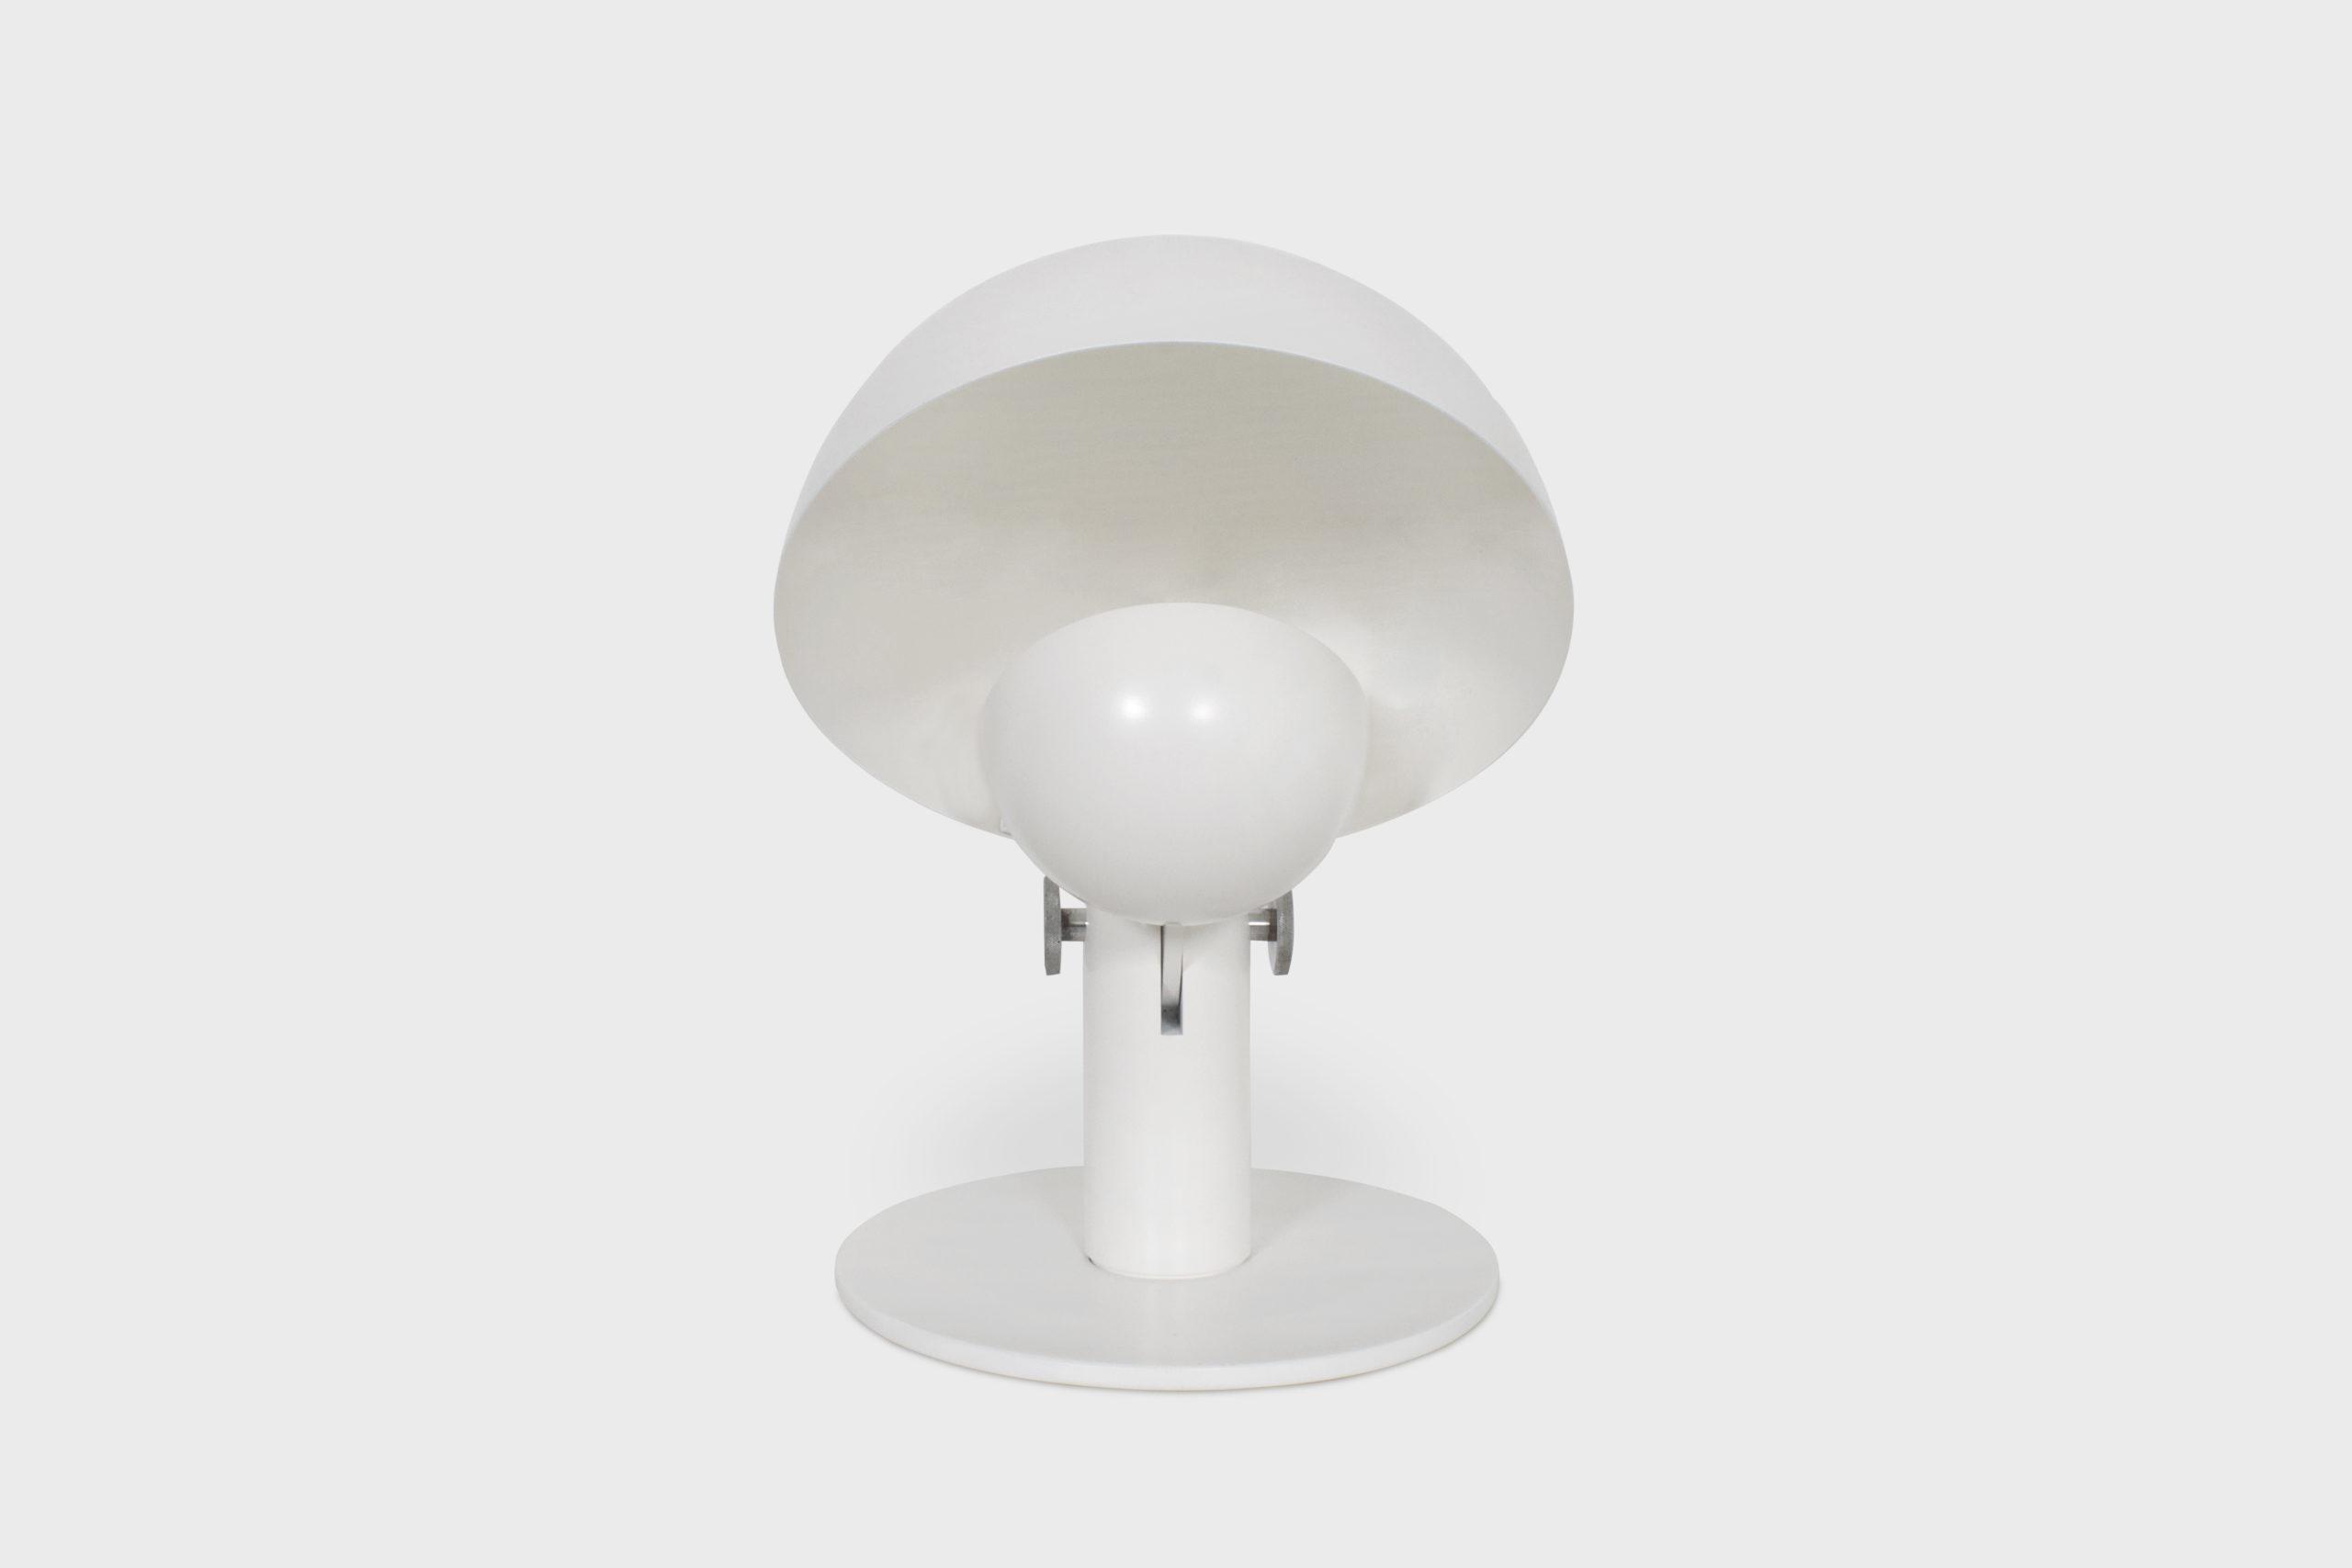 Francesco Buzzi 'Cuffia' Table Lamp by Bieffeplast Studio